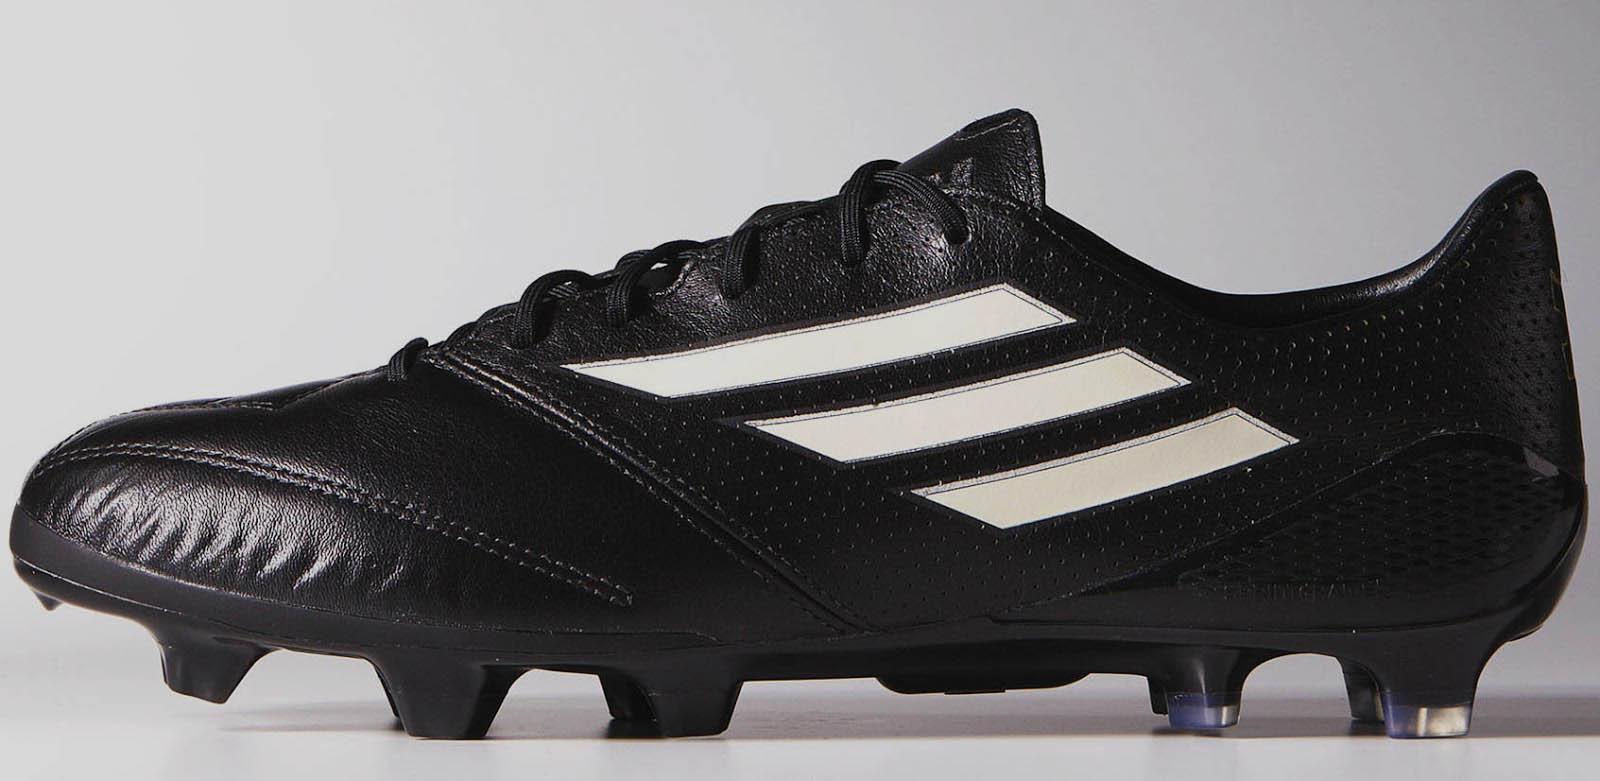 podolski debuts k leather adidas f50 adizero boots footy. Black Bedroom Furniture Sets. Home Design Ideas